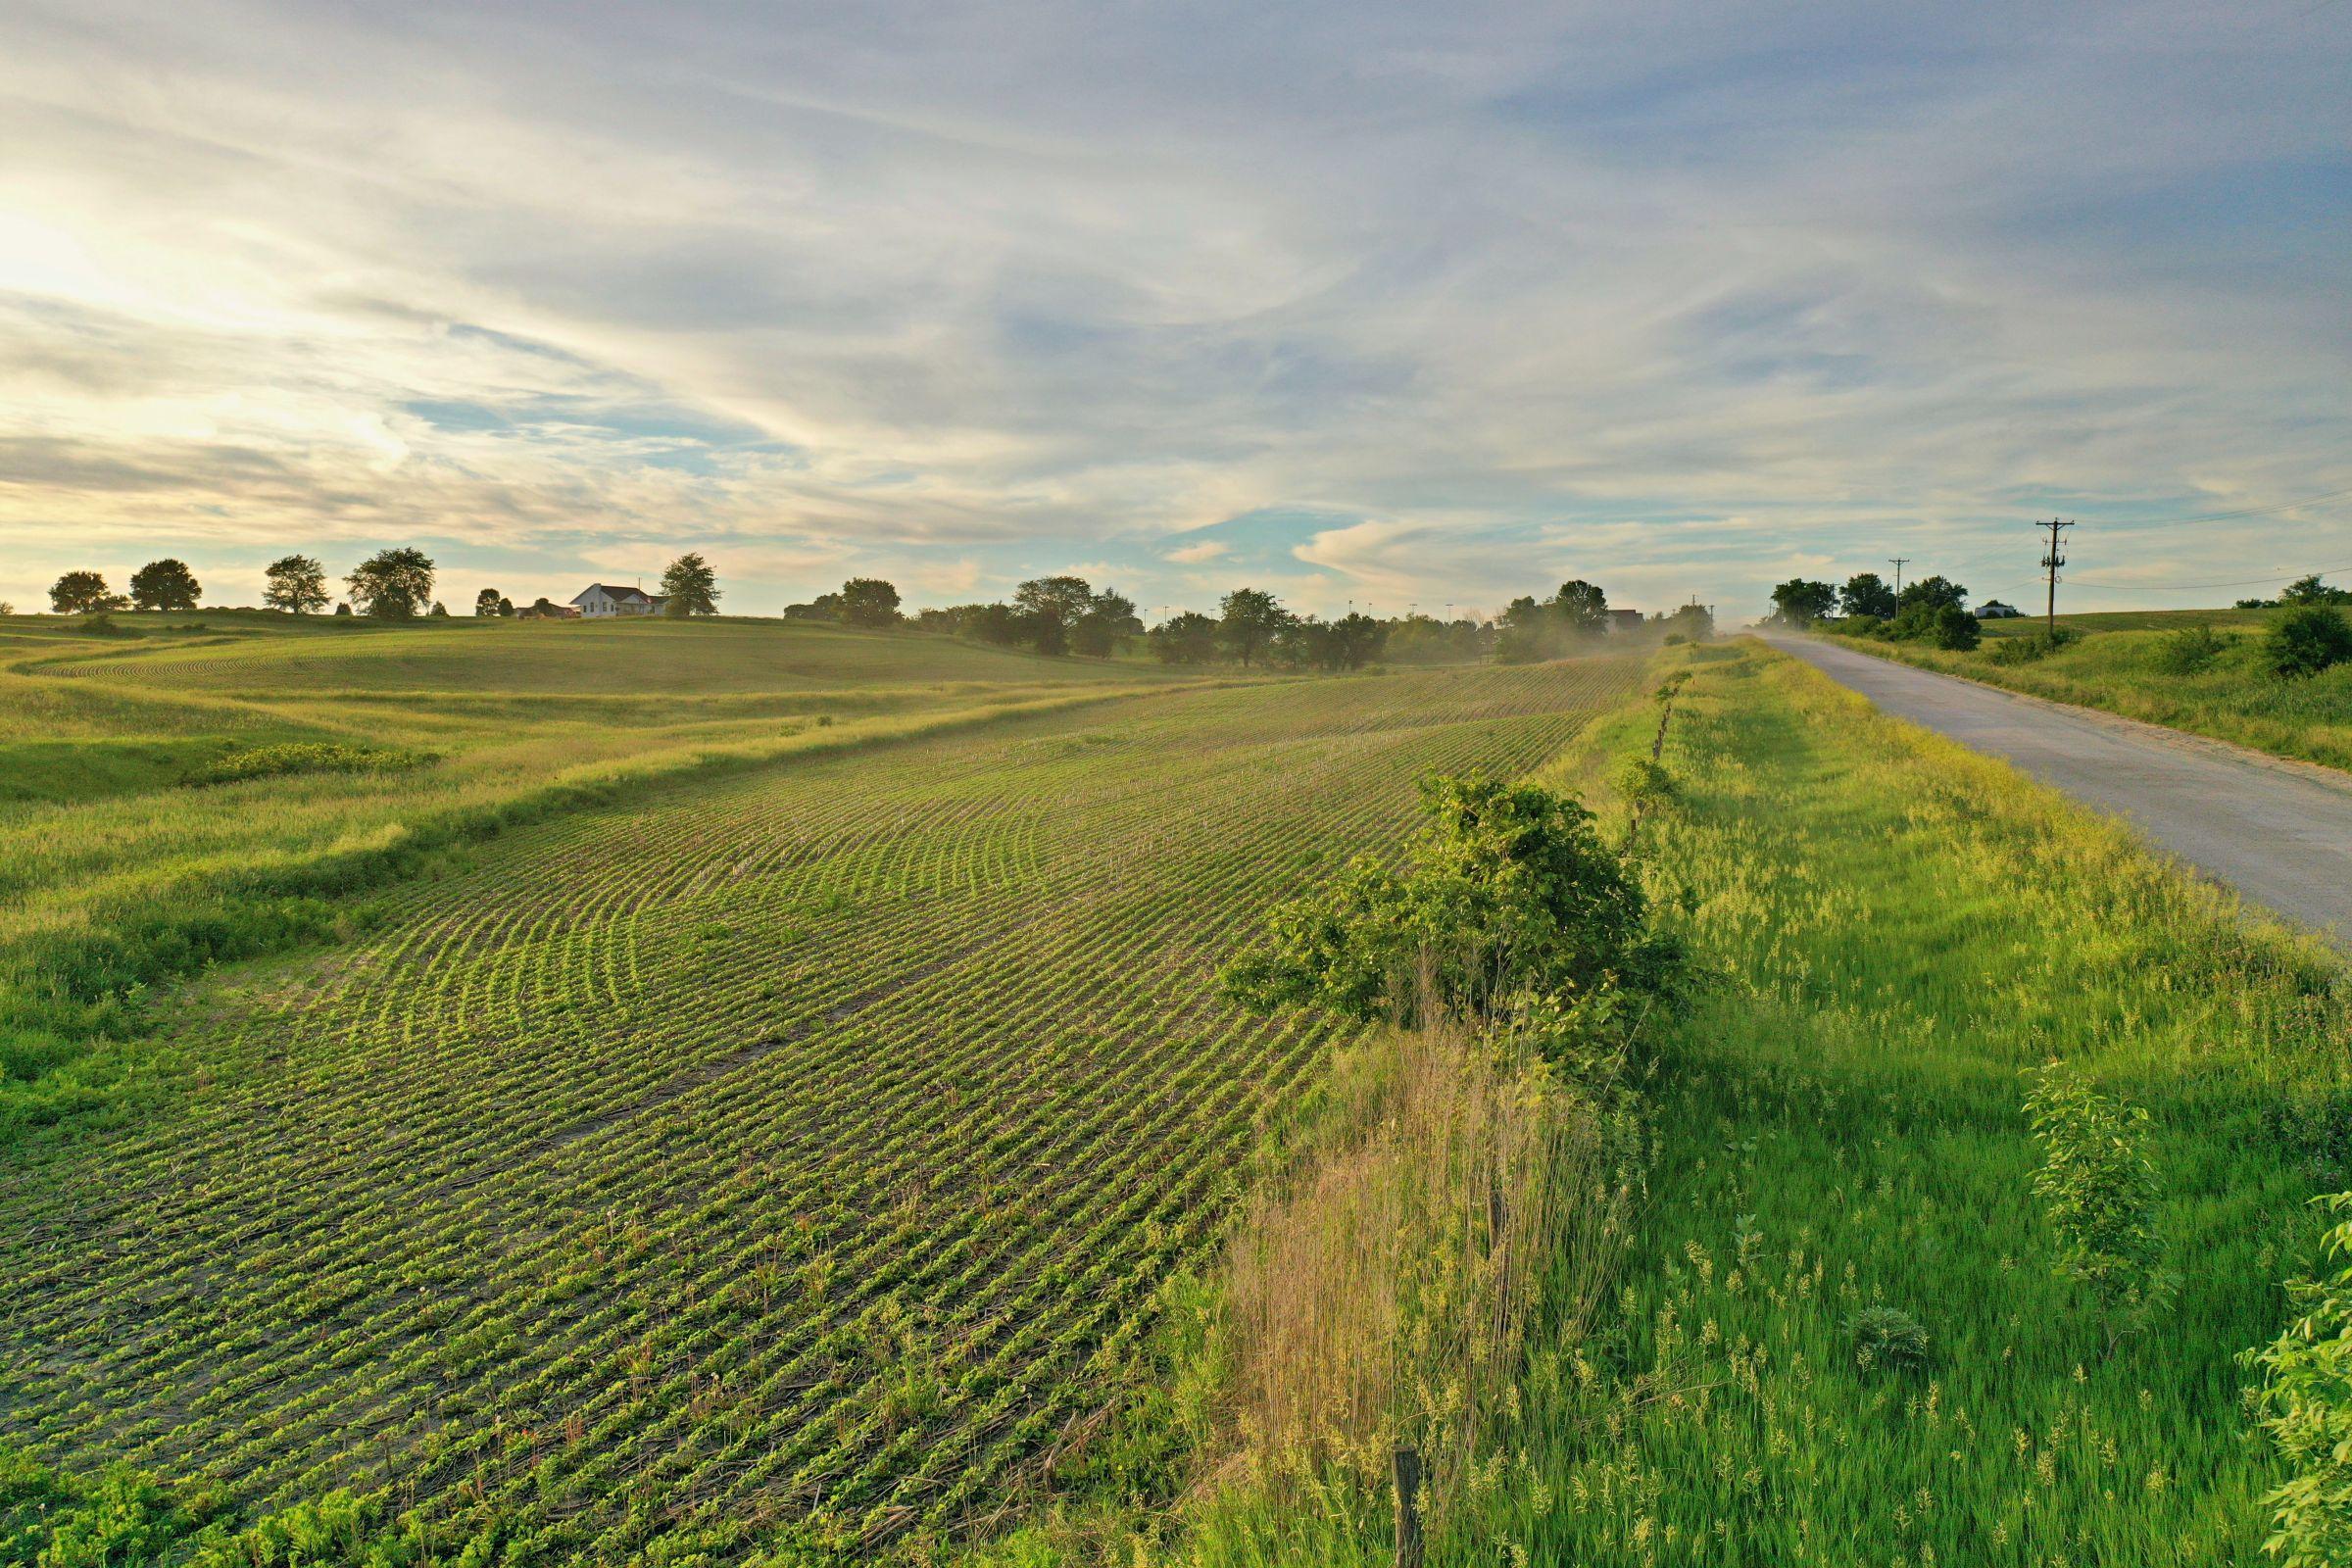 development-land-warren-county-iowa-20-acres-listing-number-15424-0-2021-03-25-201253.JPG